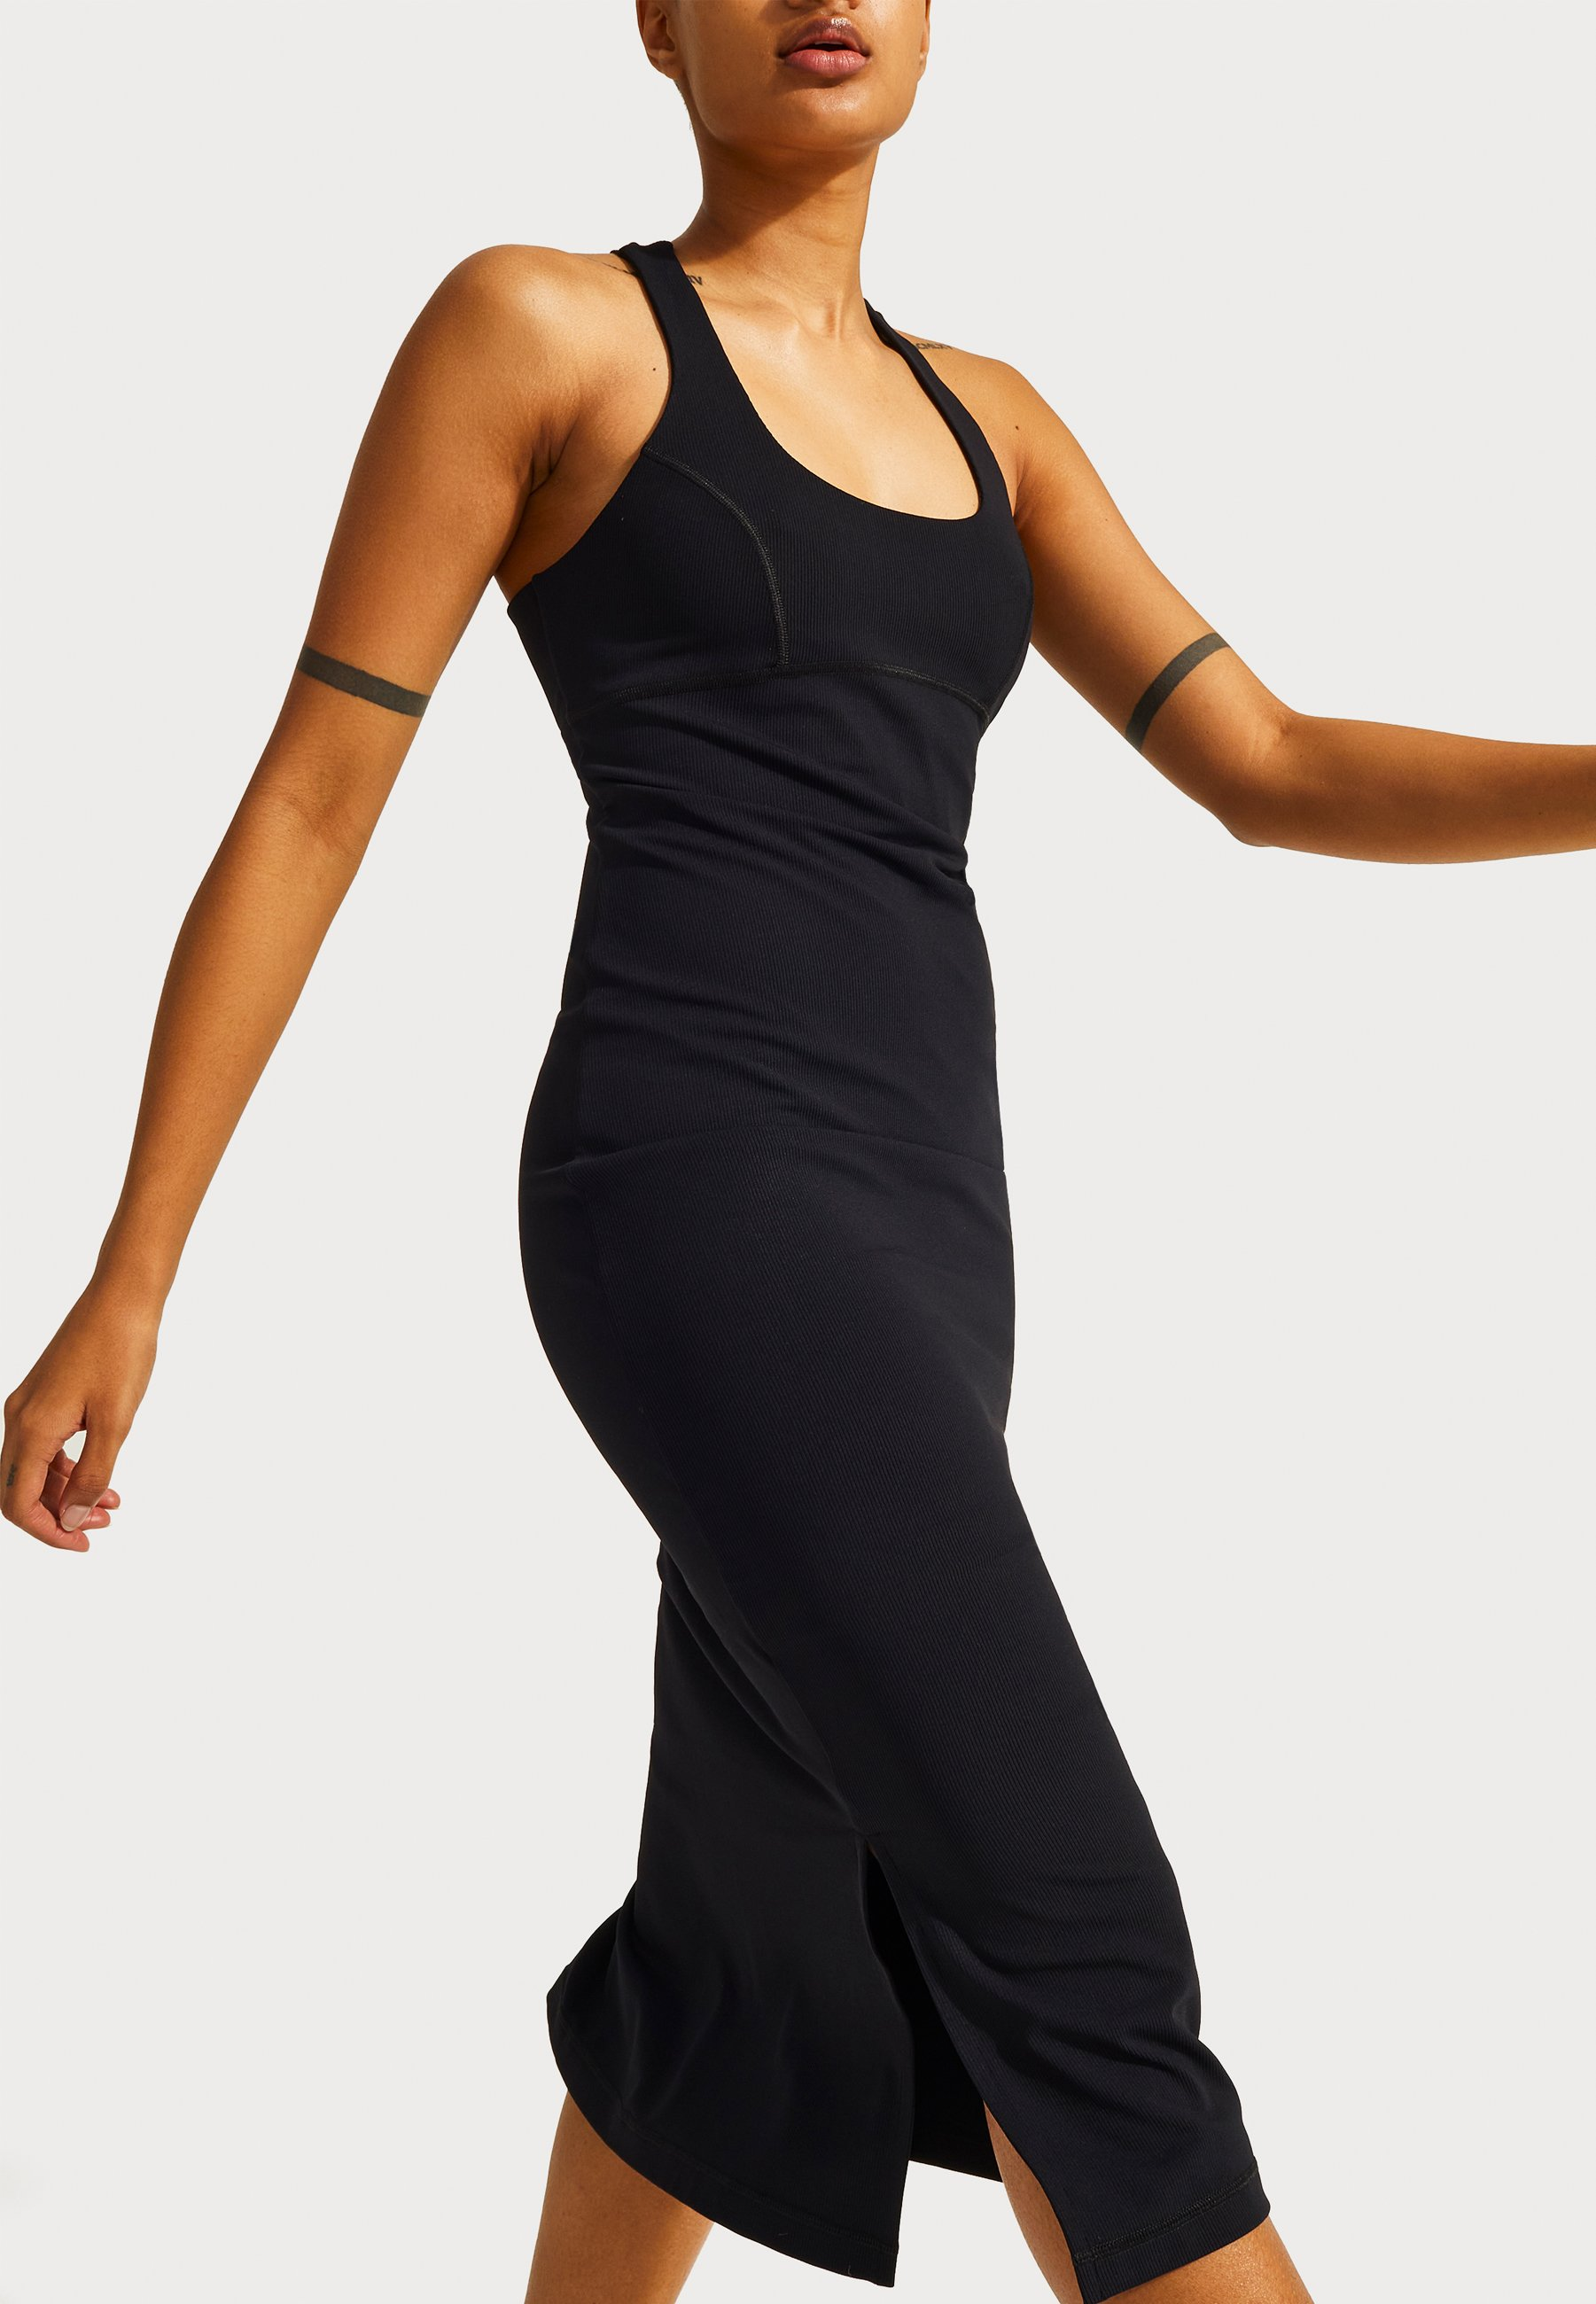 Women SWEATY BETTY X HALLE BERRY EMILY STRAPPY BACK DRESS - Jersey dress